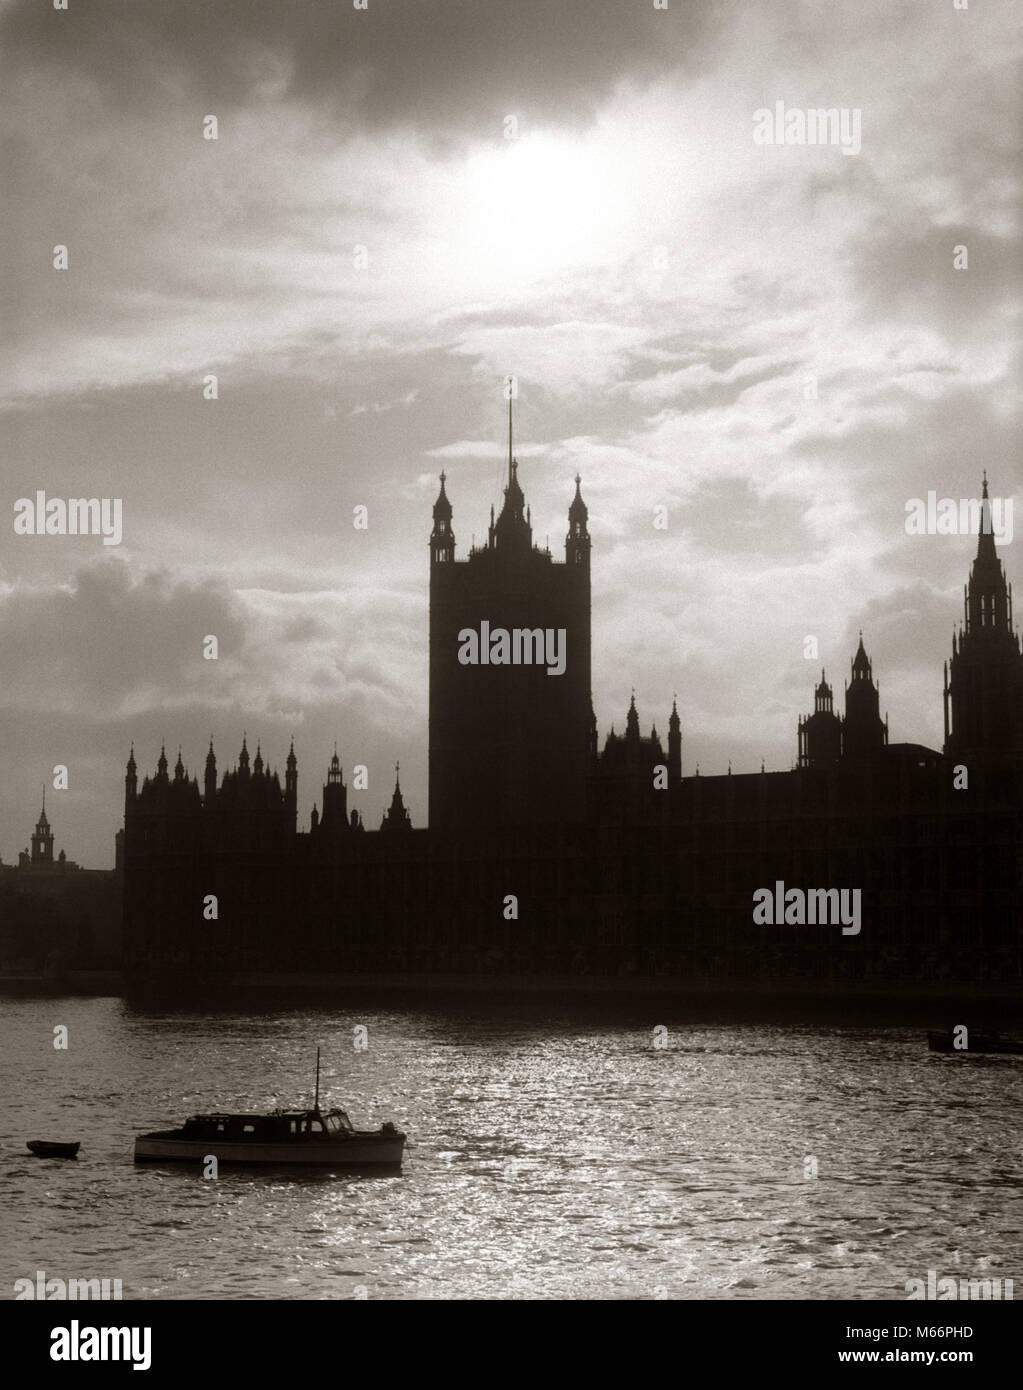 1930s 1940s HOUSES OF PARLIAMENT SILHOUETTE SKYLINE LONDON ENGLAND BLACKOUT